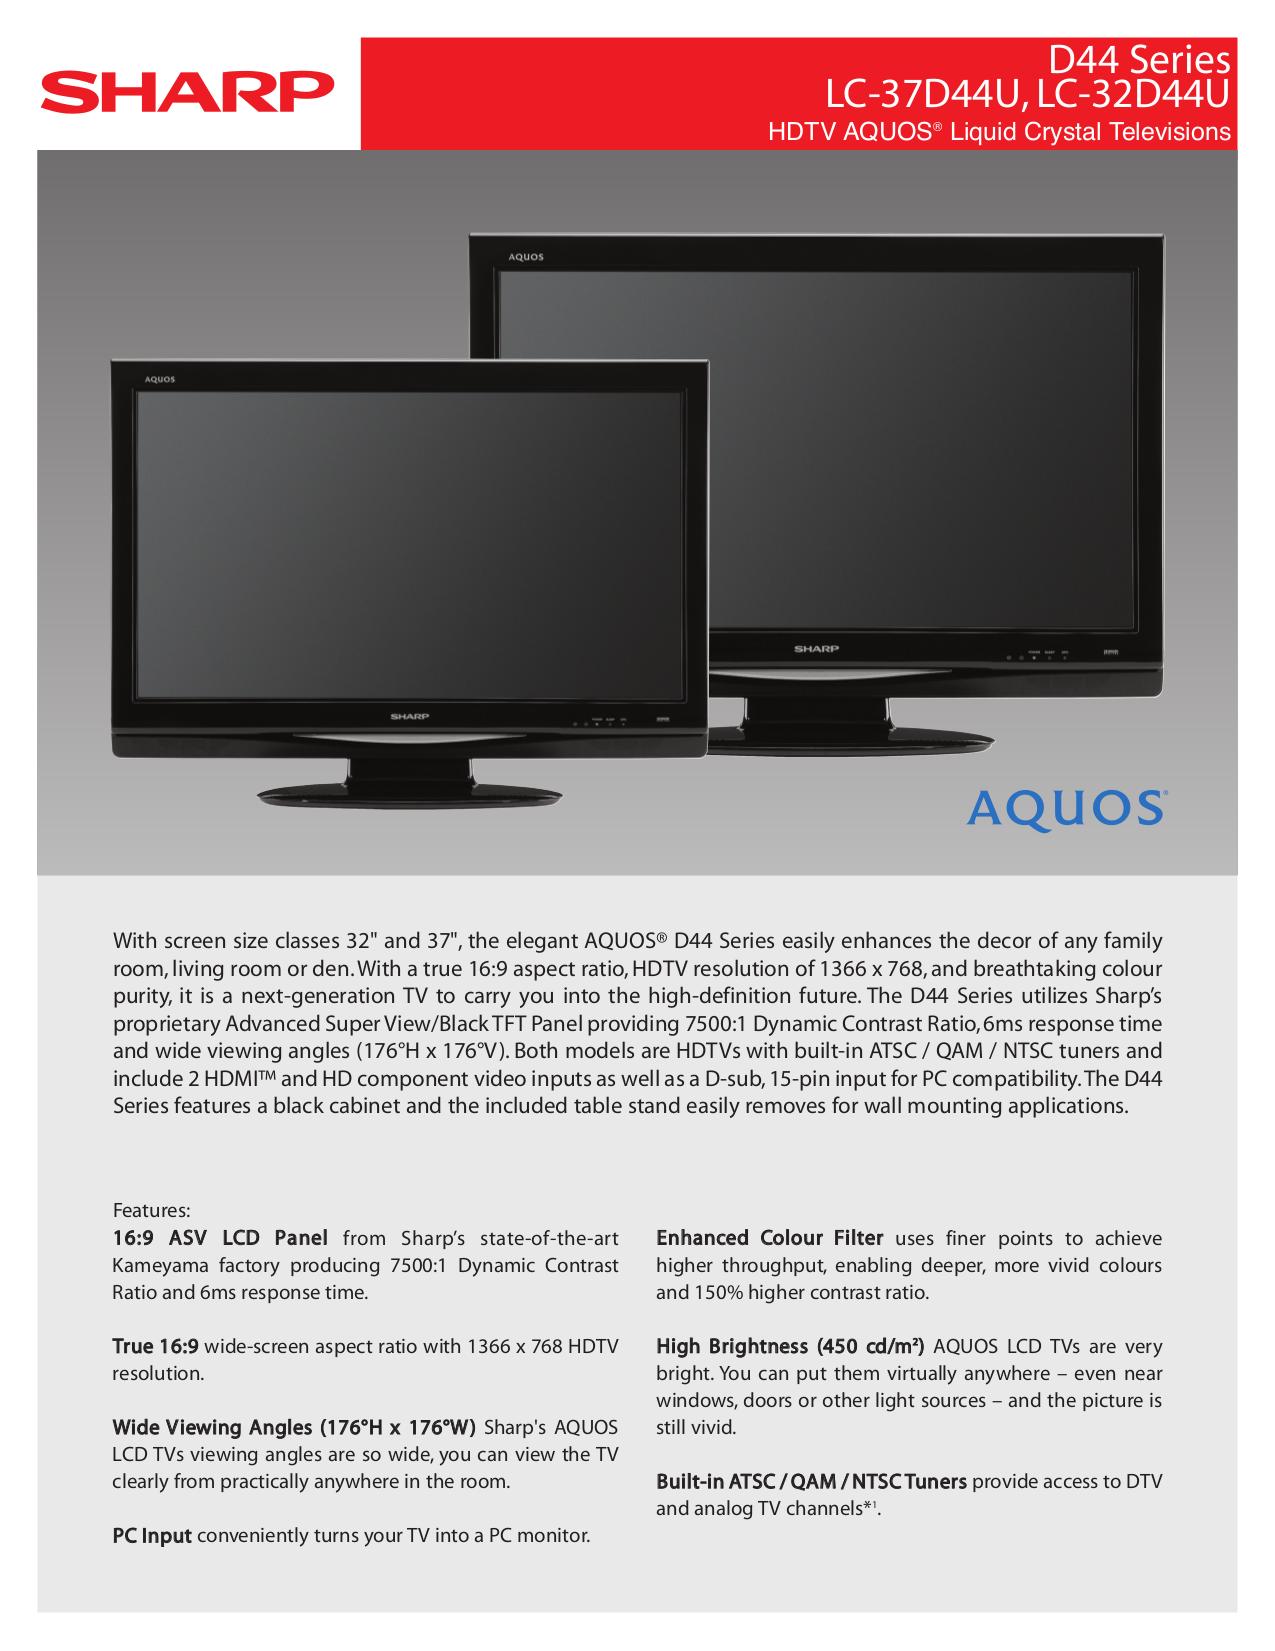 sharp aquos lc c3742u manual free owners manual u2022 rh wordworksbysea com Sharp AQUOS Troubleshoot Reset Sharp AQUOS HDTV